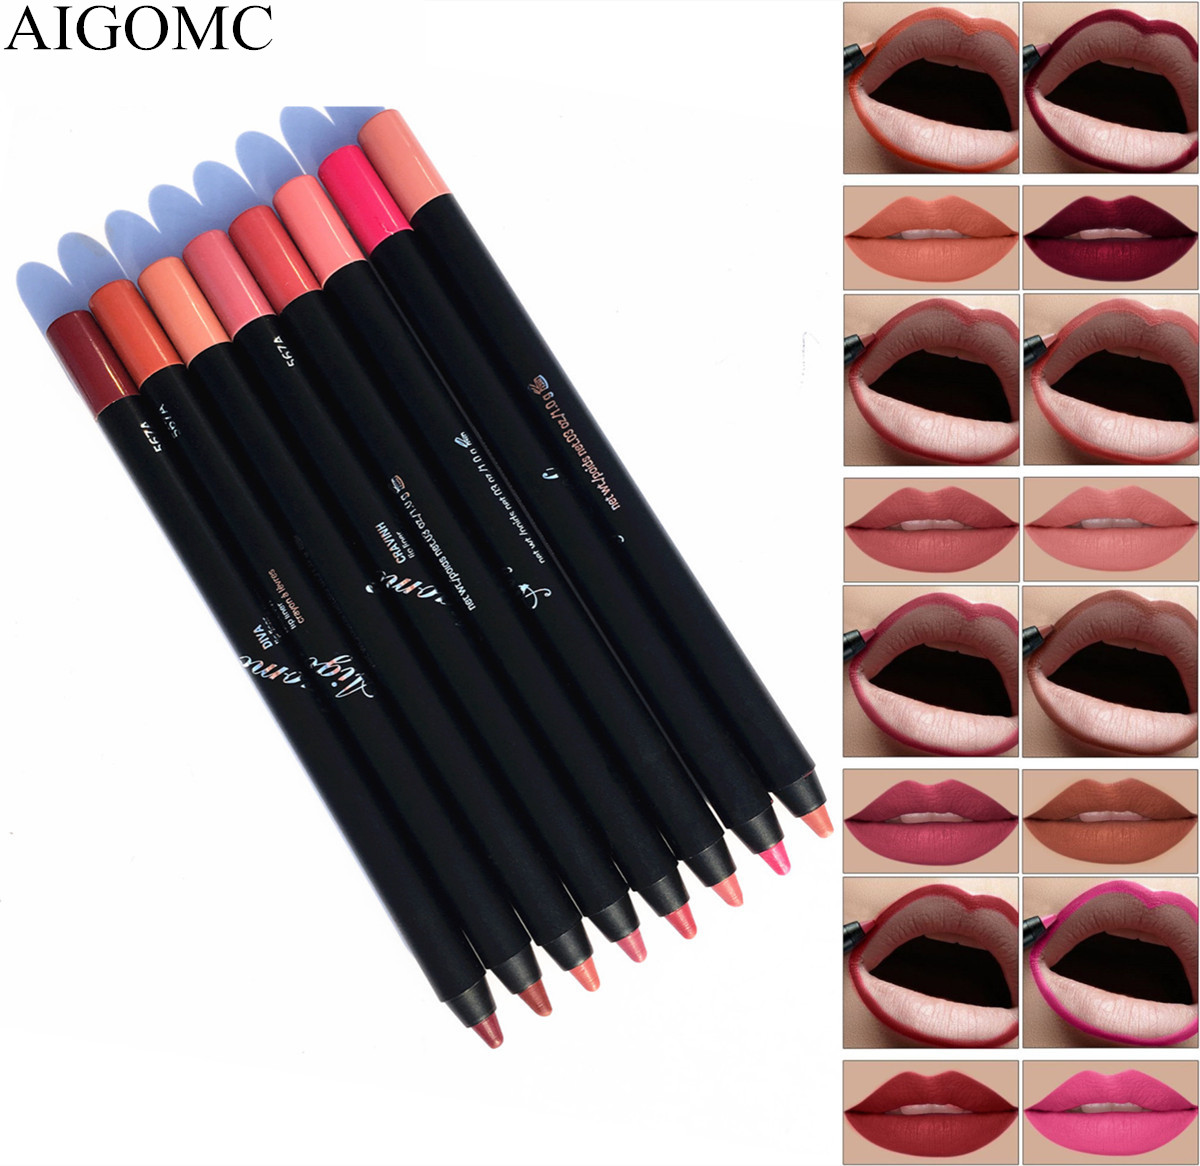 AIGOMC 8 Colors/Set waterproof lip liner pencil sexy full lipstick female long-lasting cosmetics beauty makeup